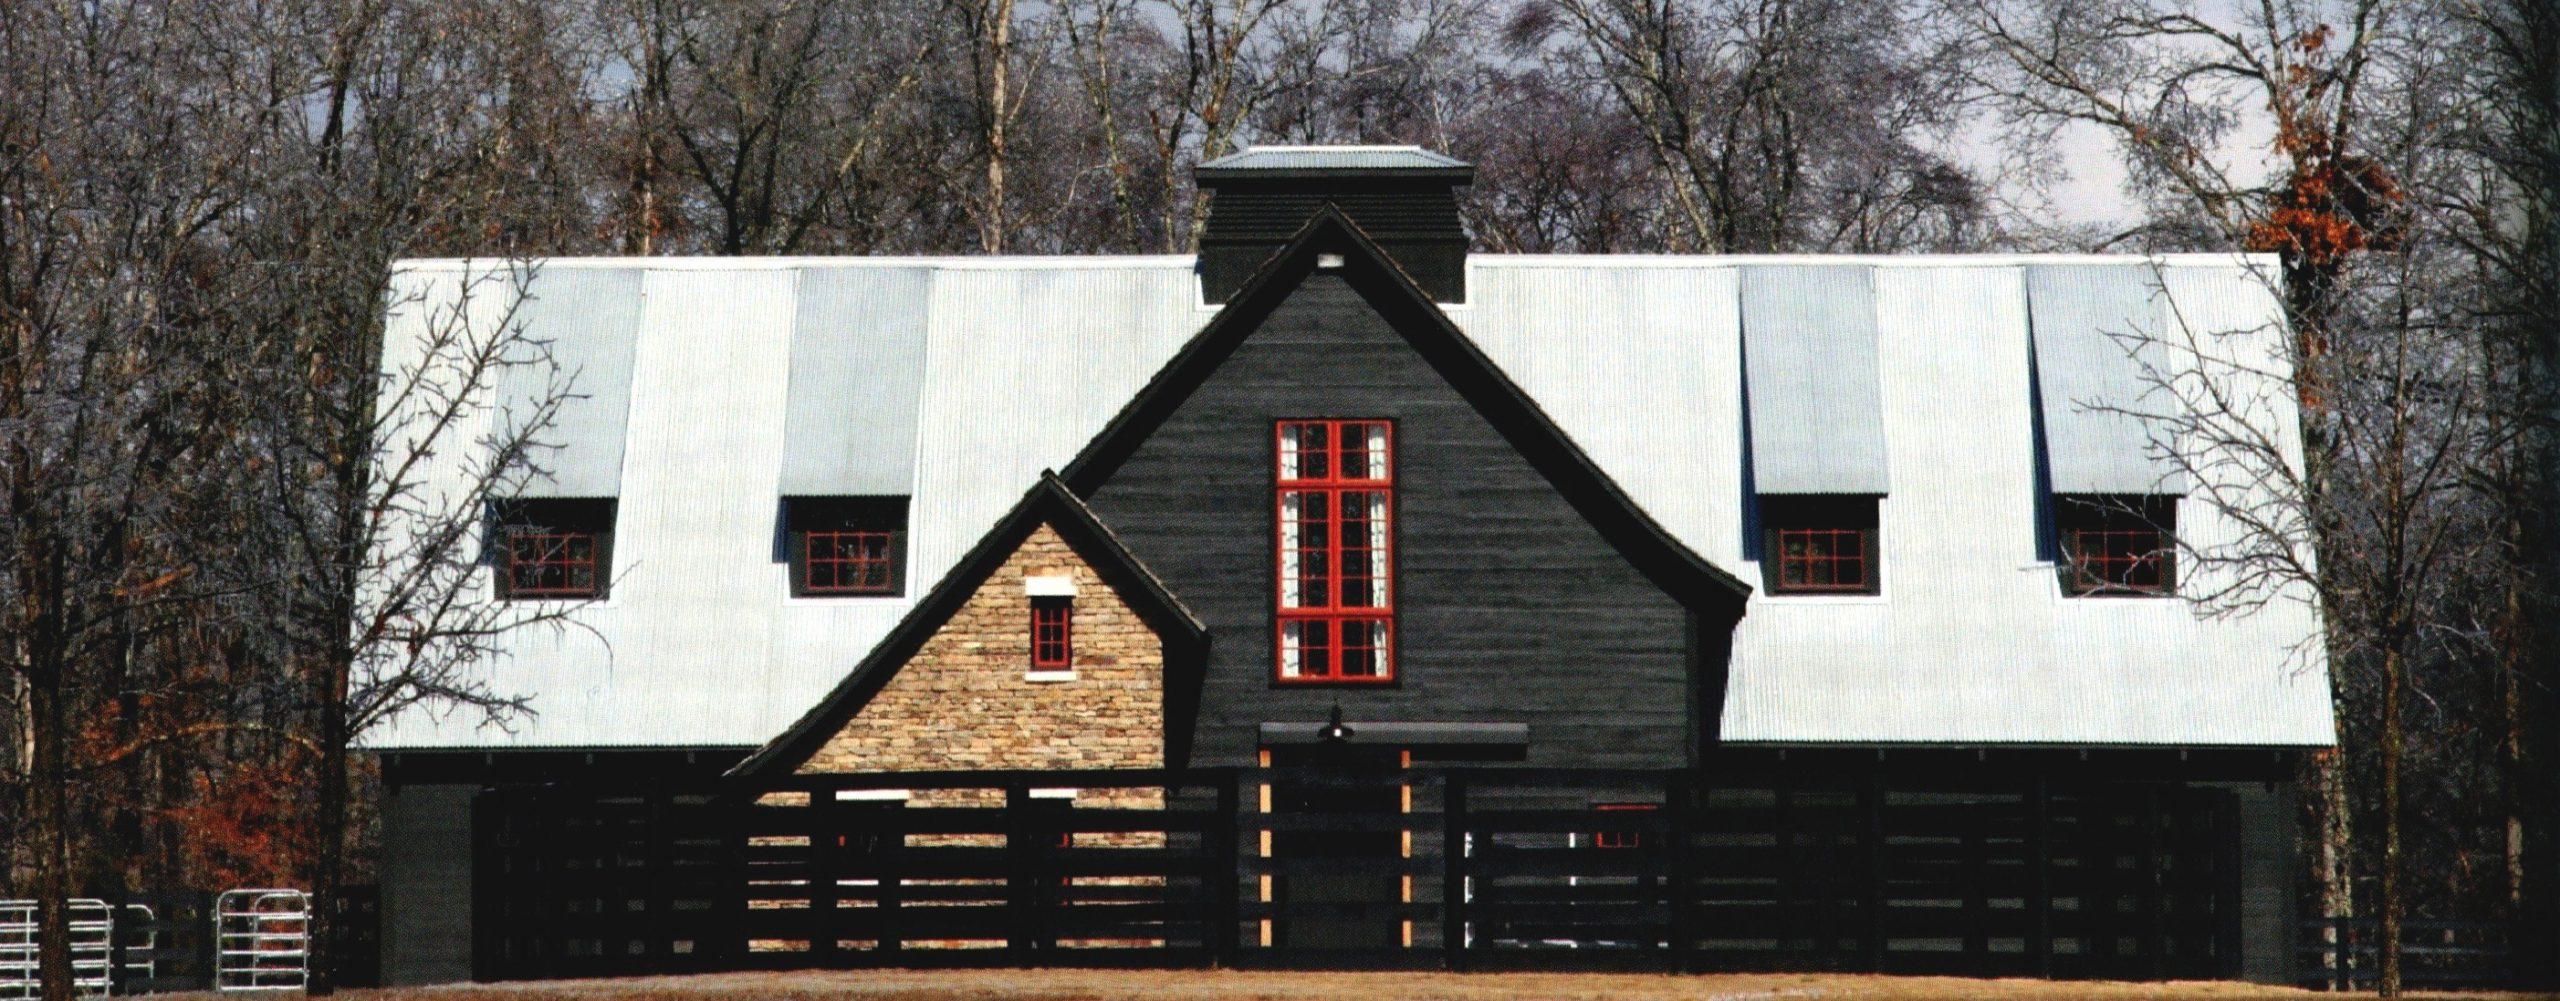 McAlpine Journal: Barn Design